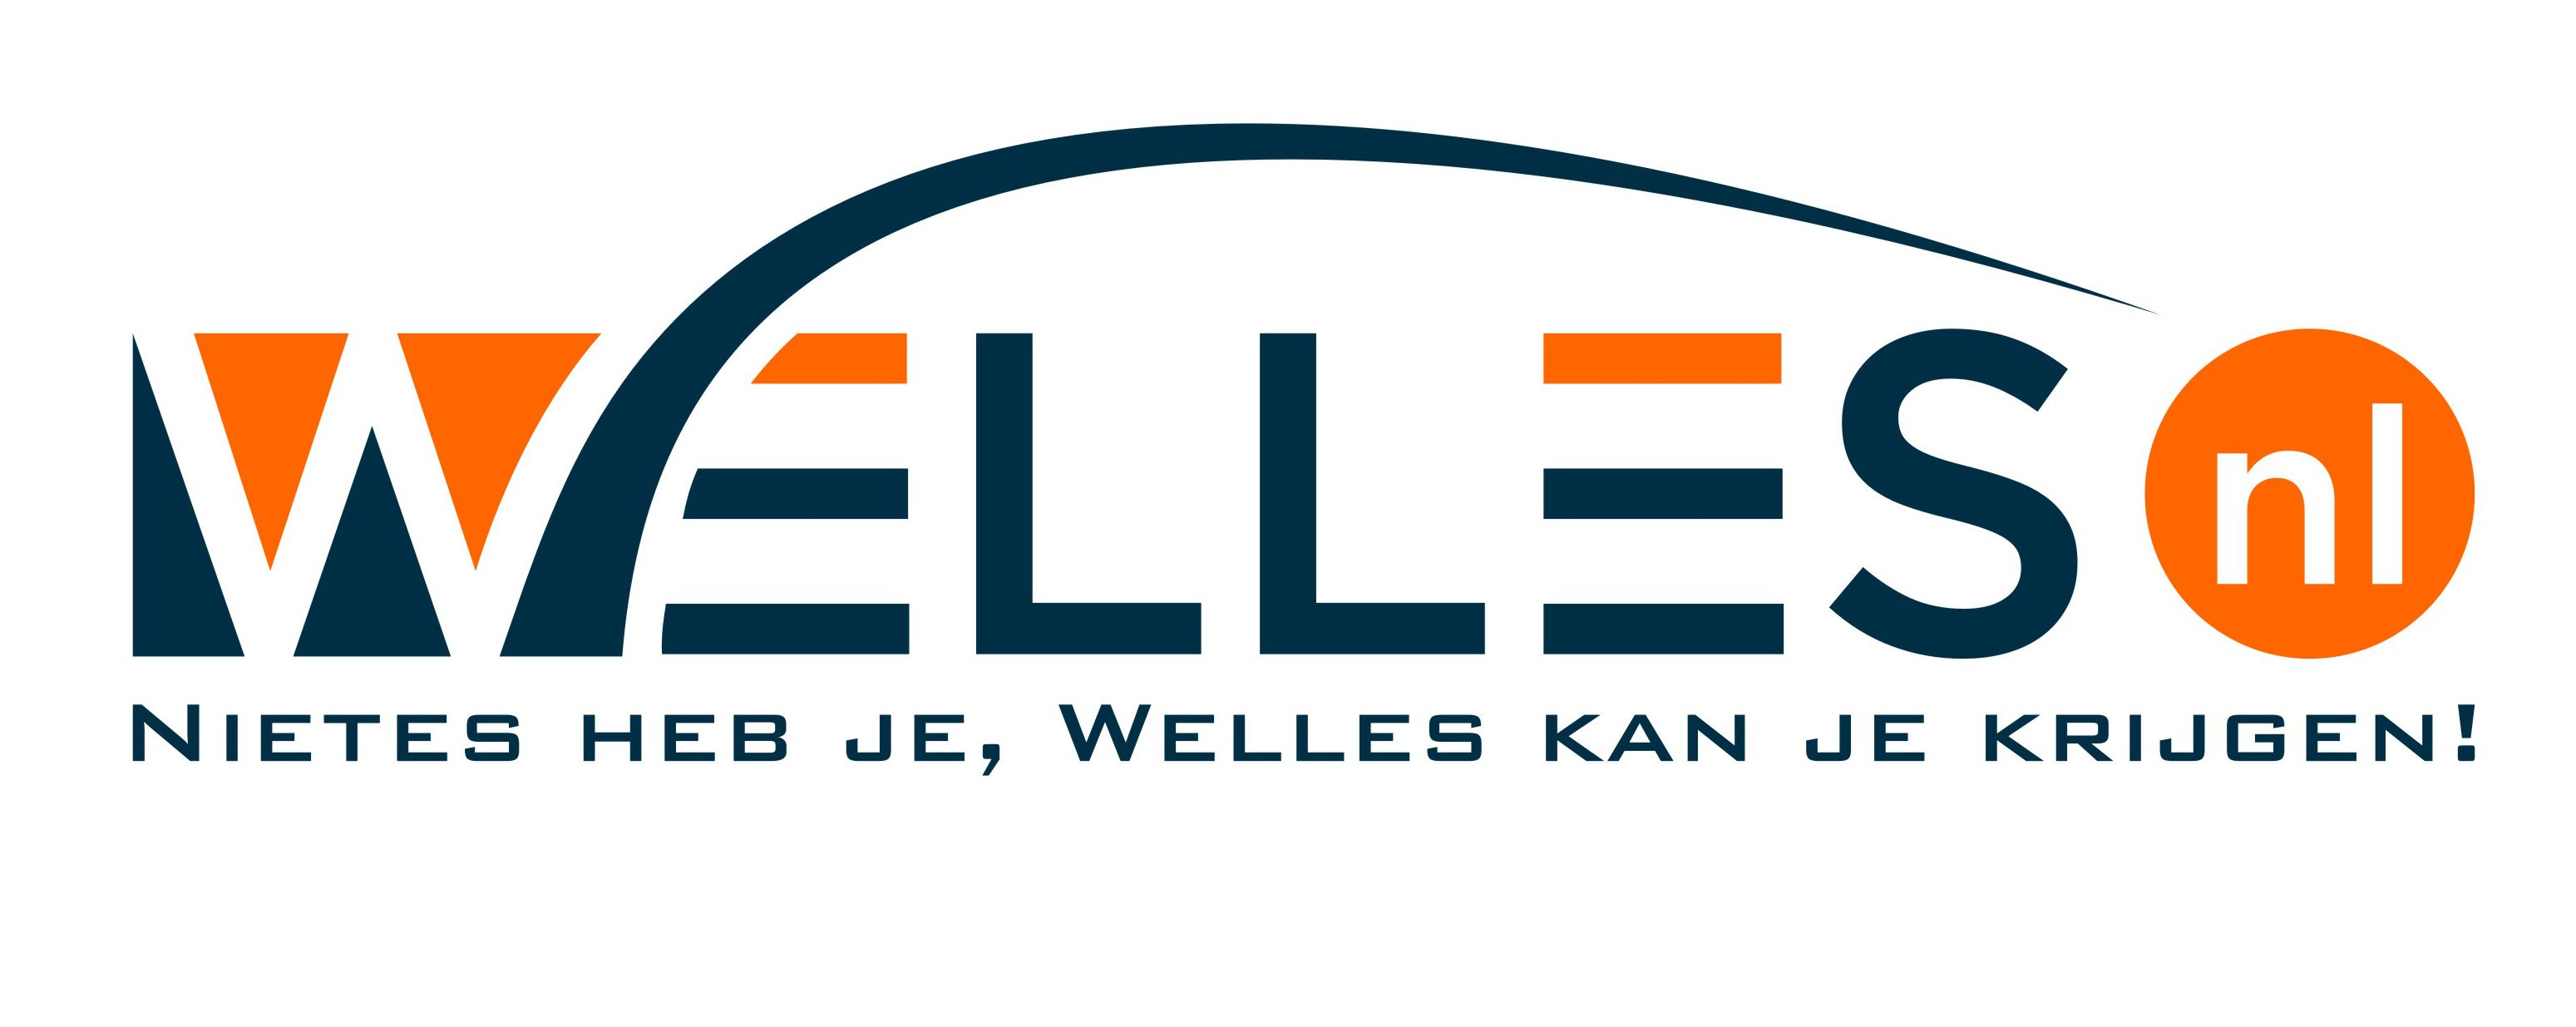 Welles.nl